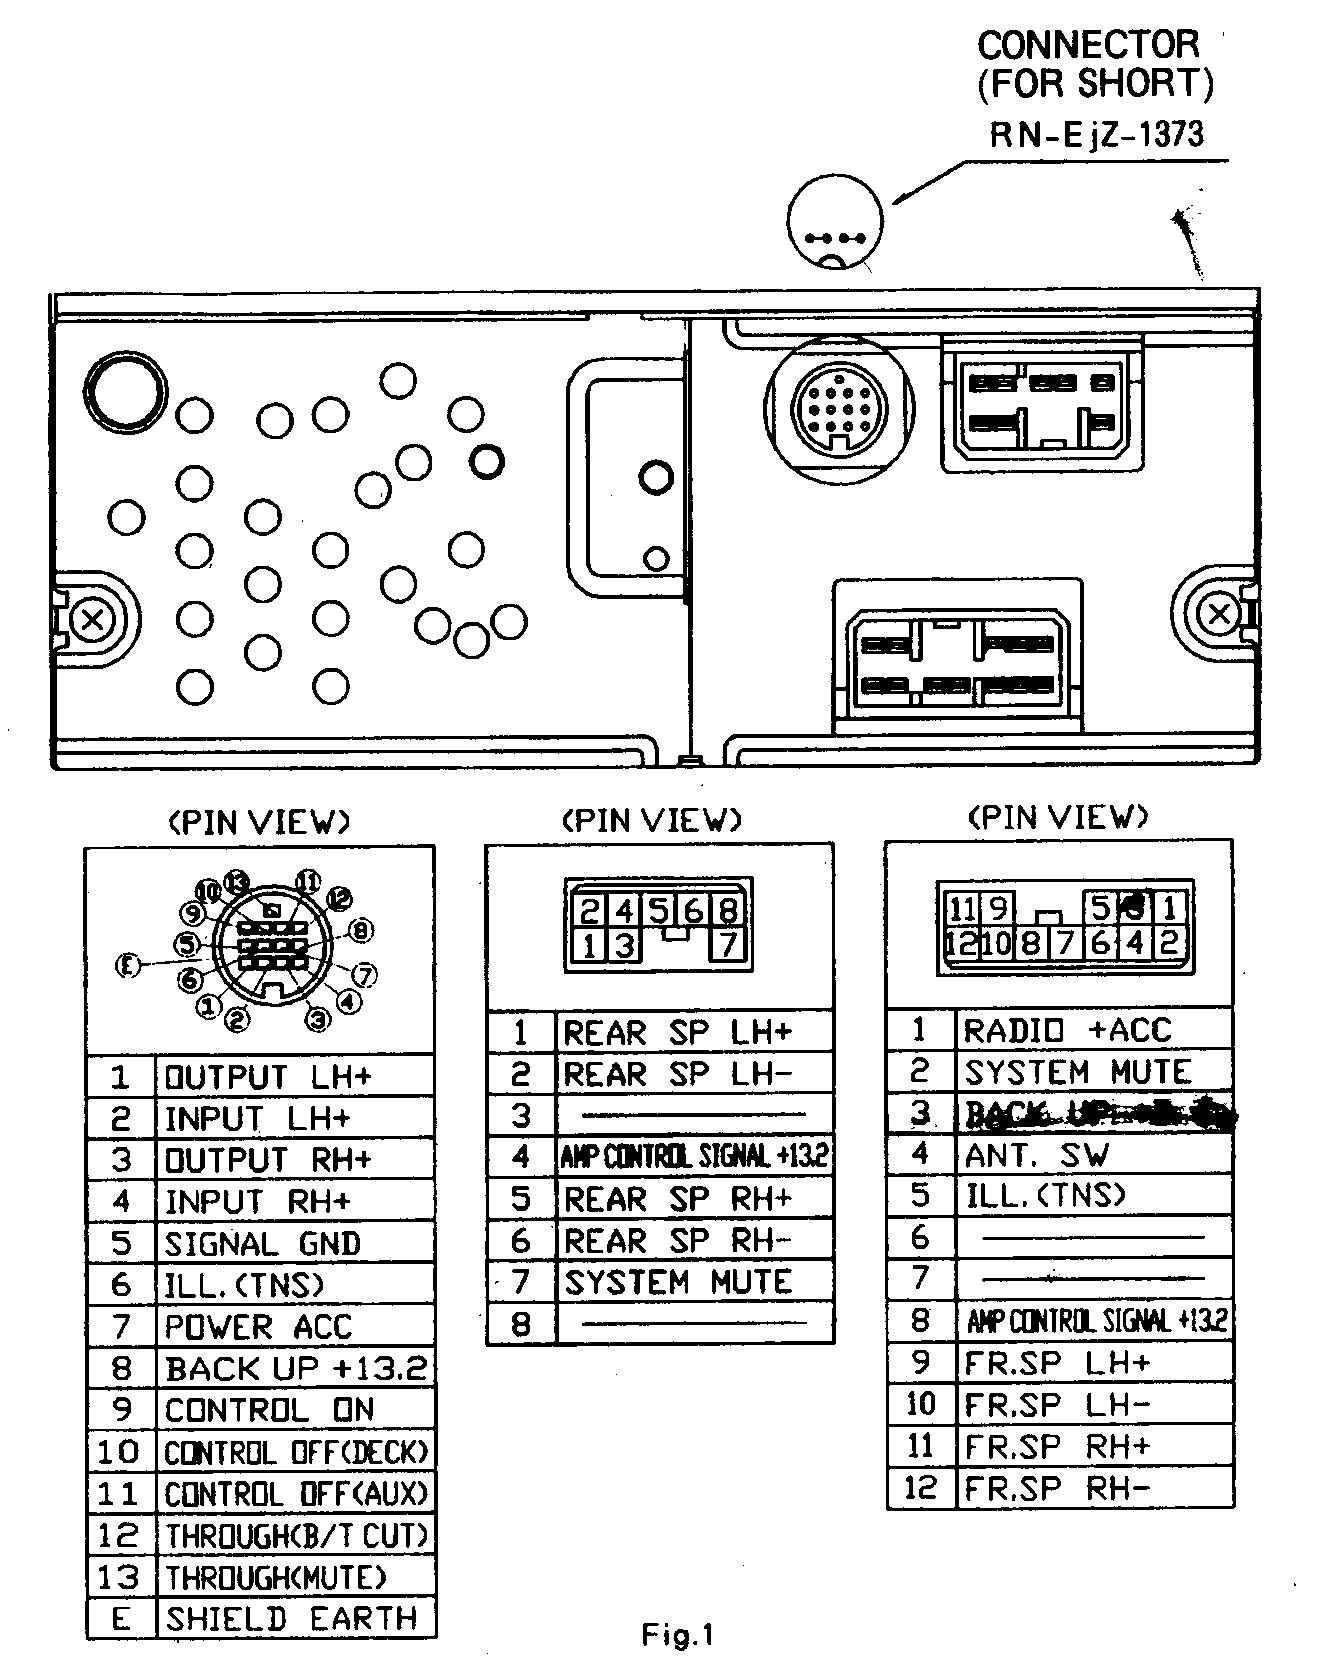 Wiring Diagram PDF: 2002 Mazda Protege Fuse Box